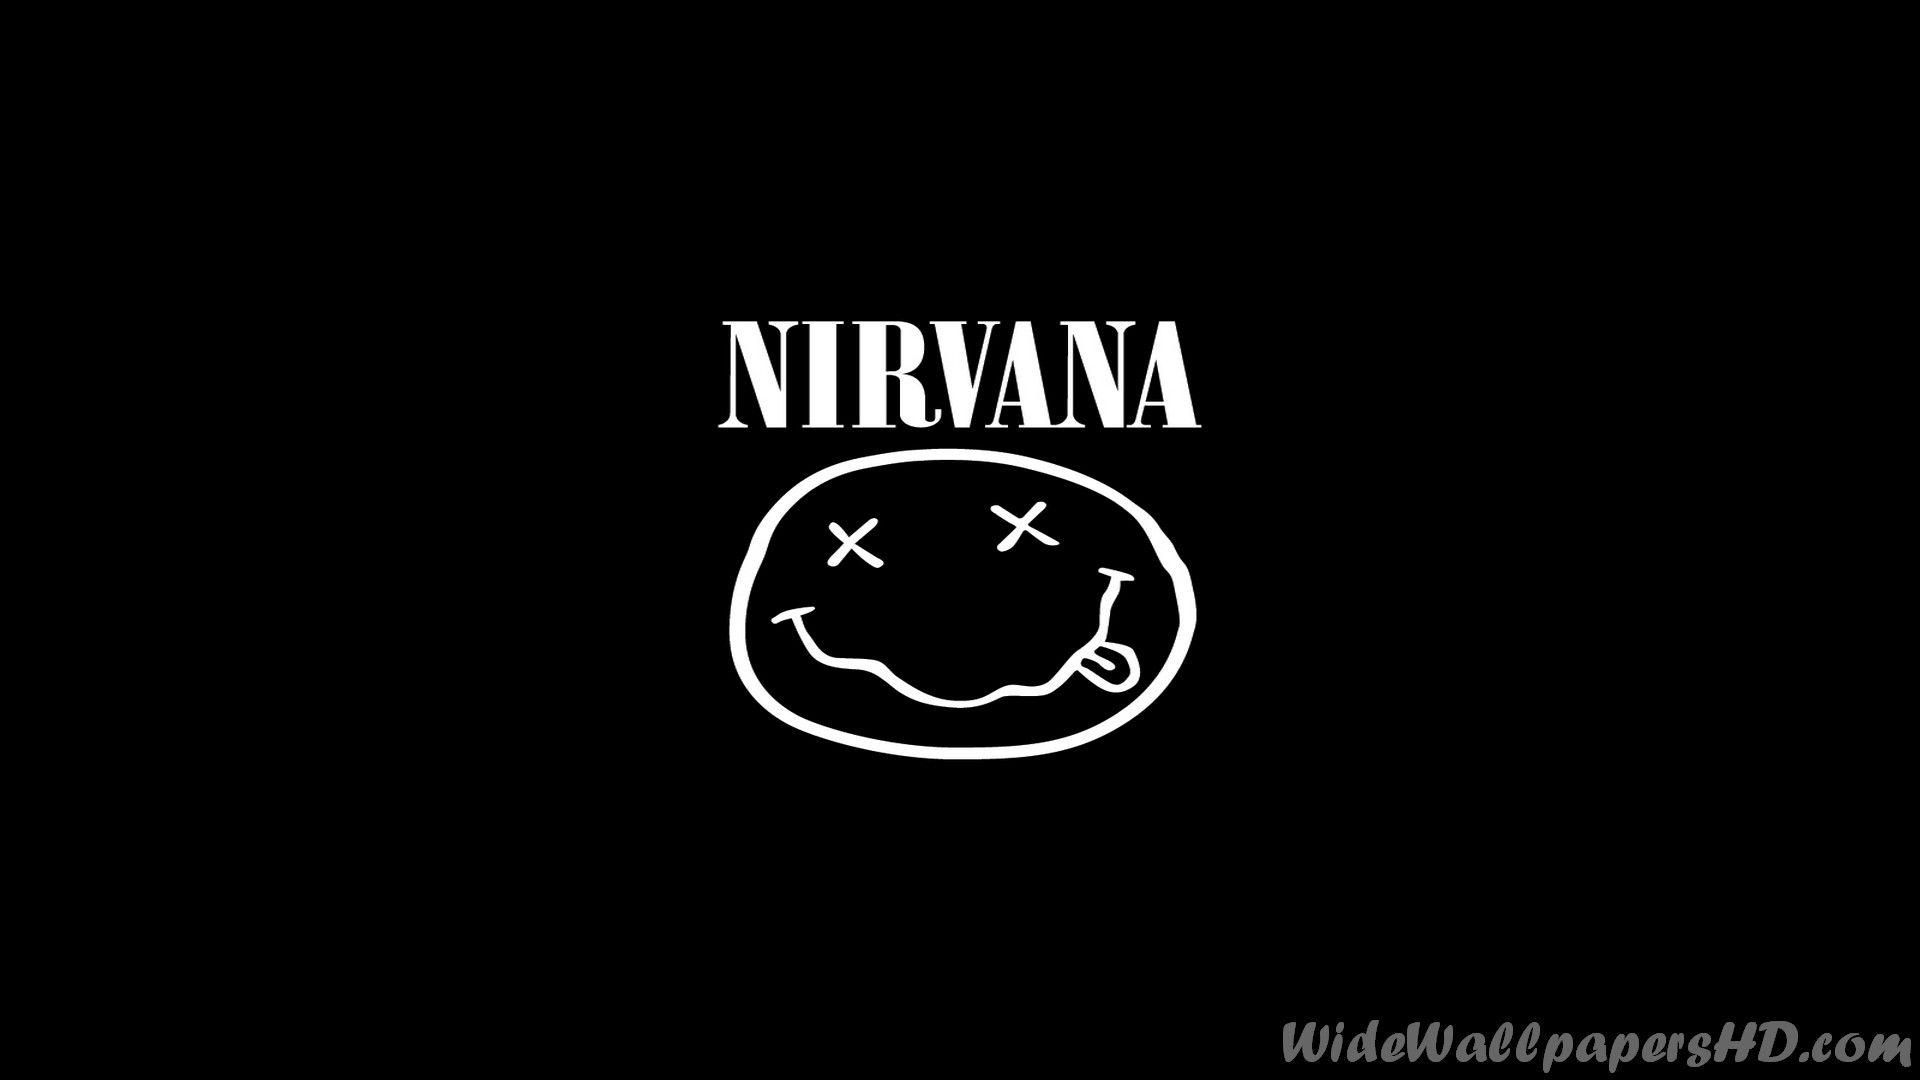 Nirvana Logo Wallpapers 1920x1080